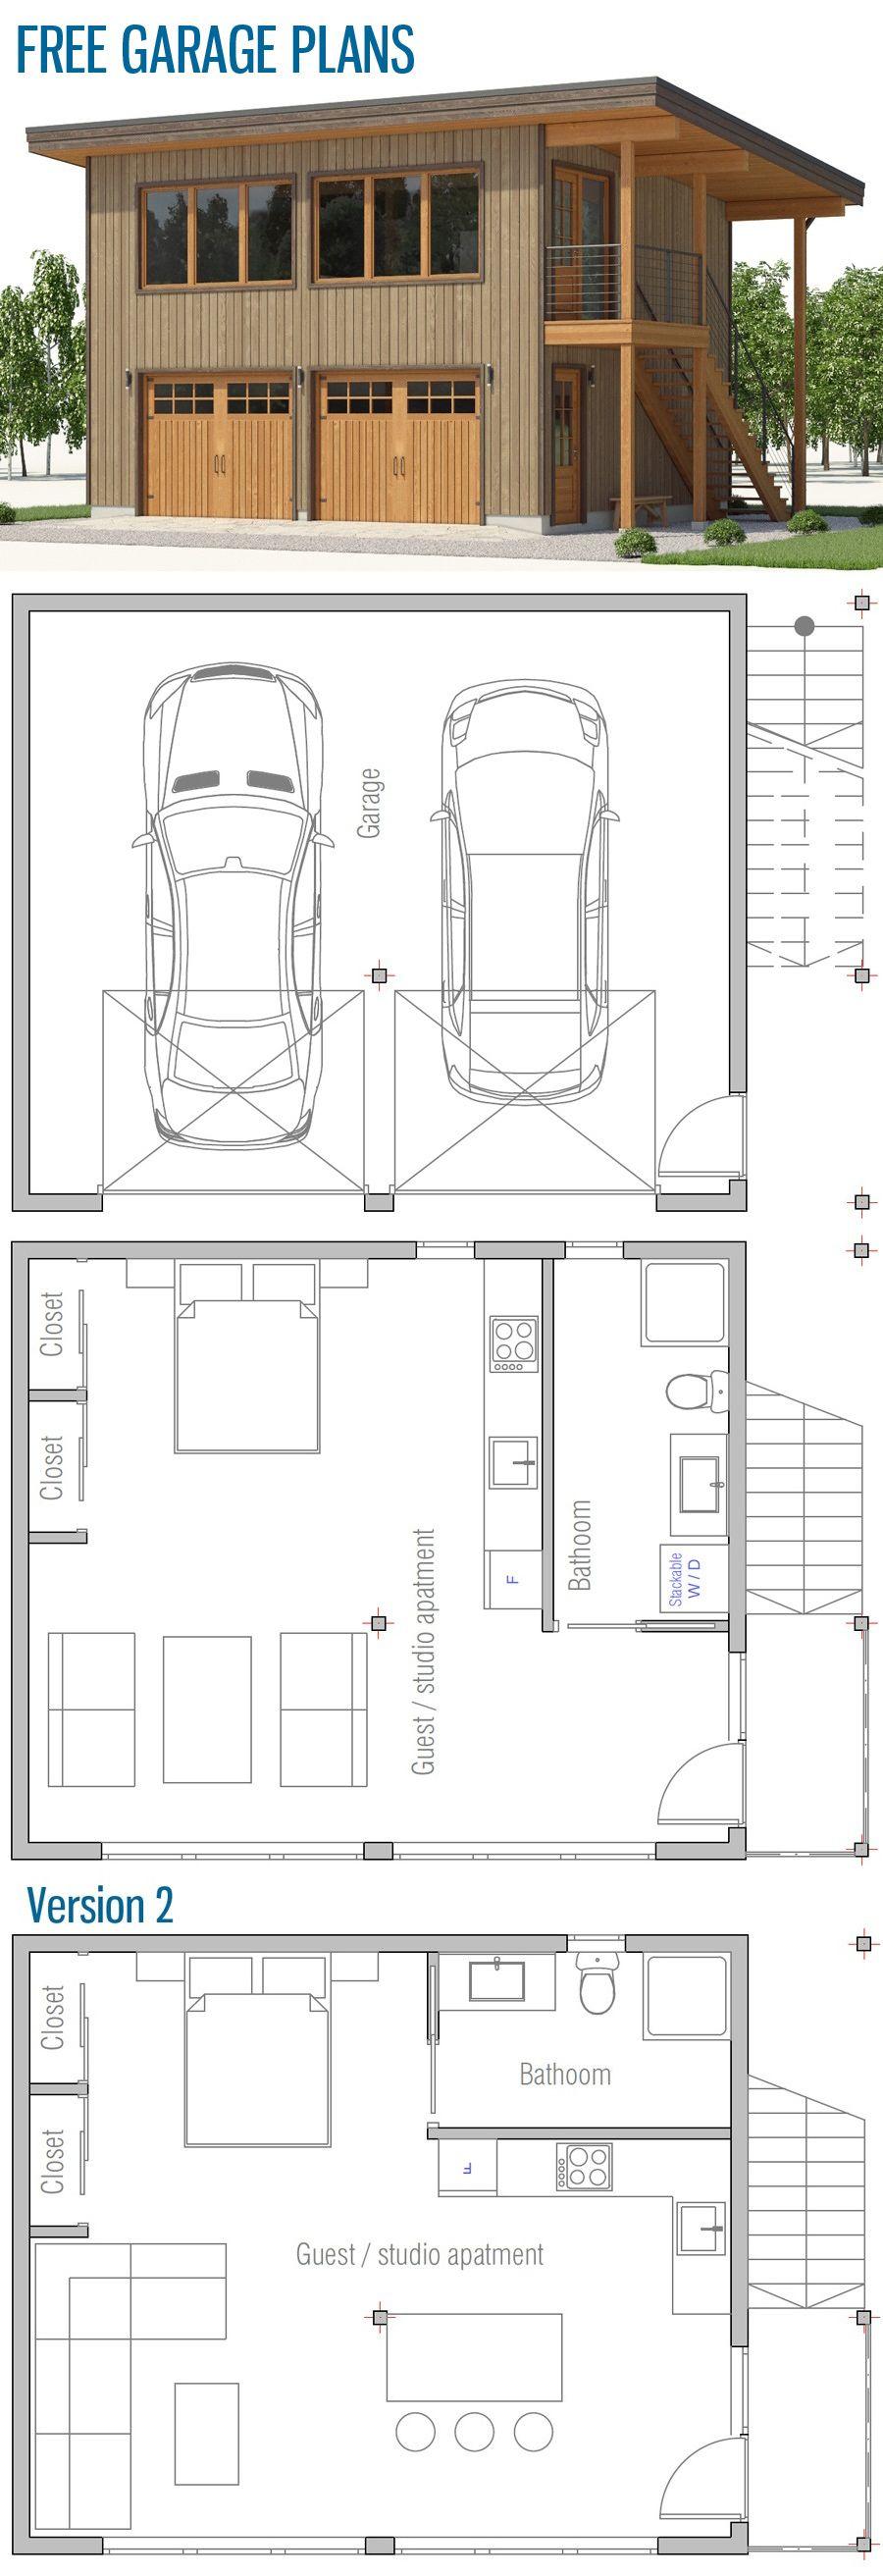 Free Garage Plans | TH/SMALL HOMES | Garage house plans, Garage ...